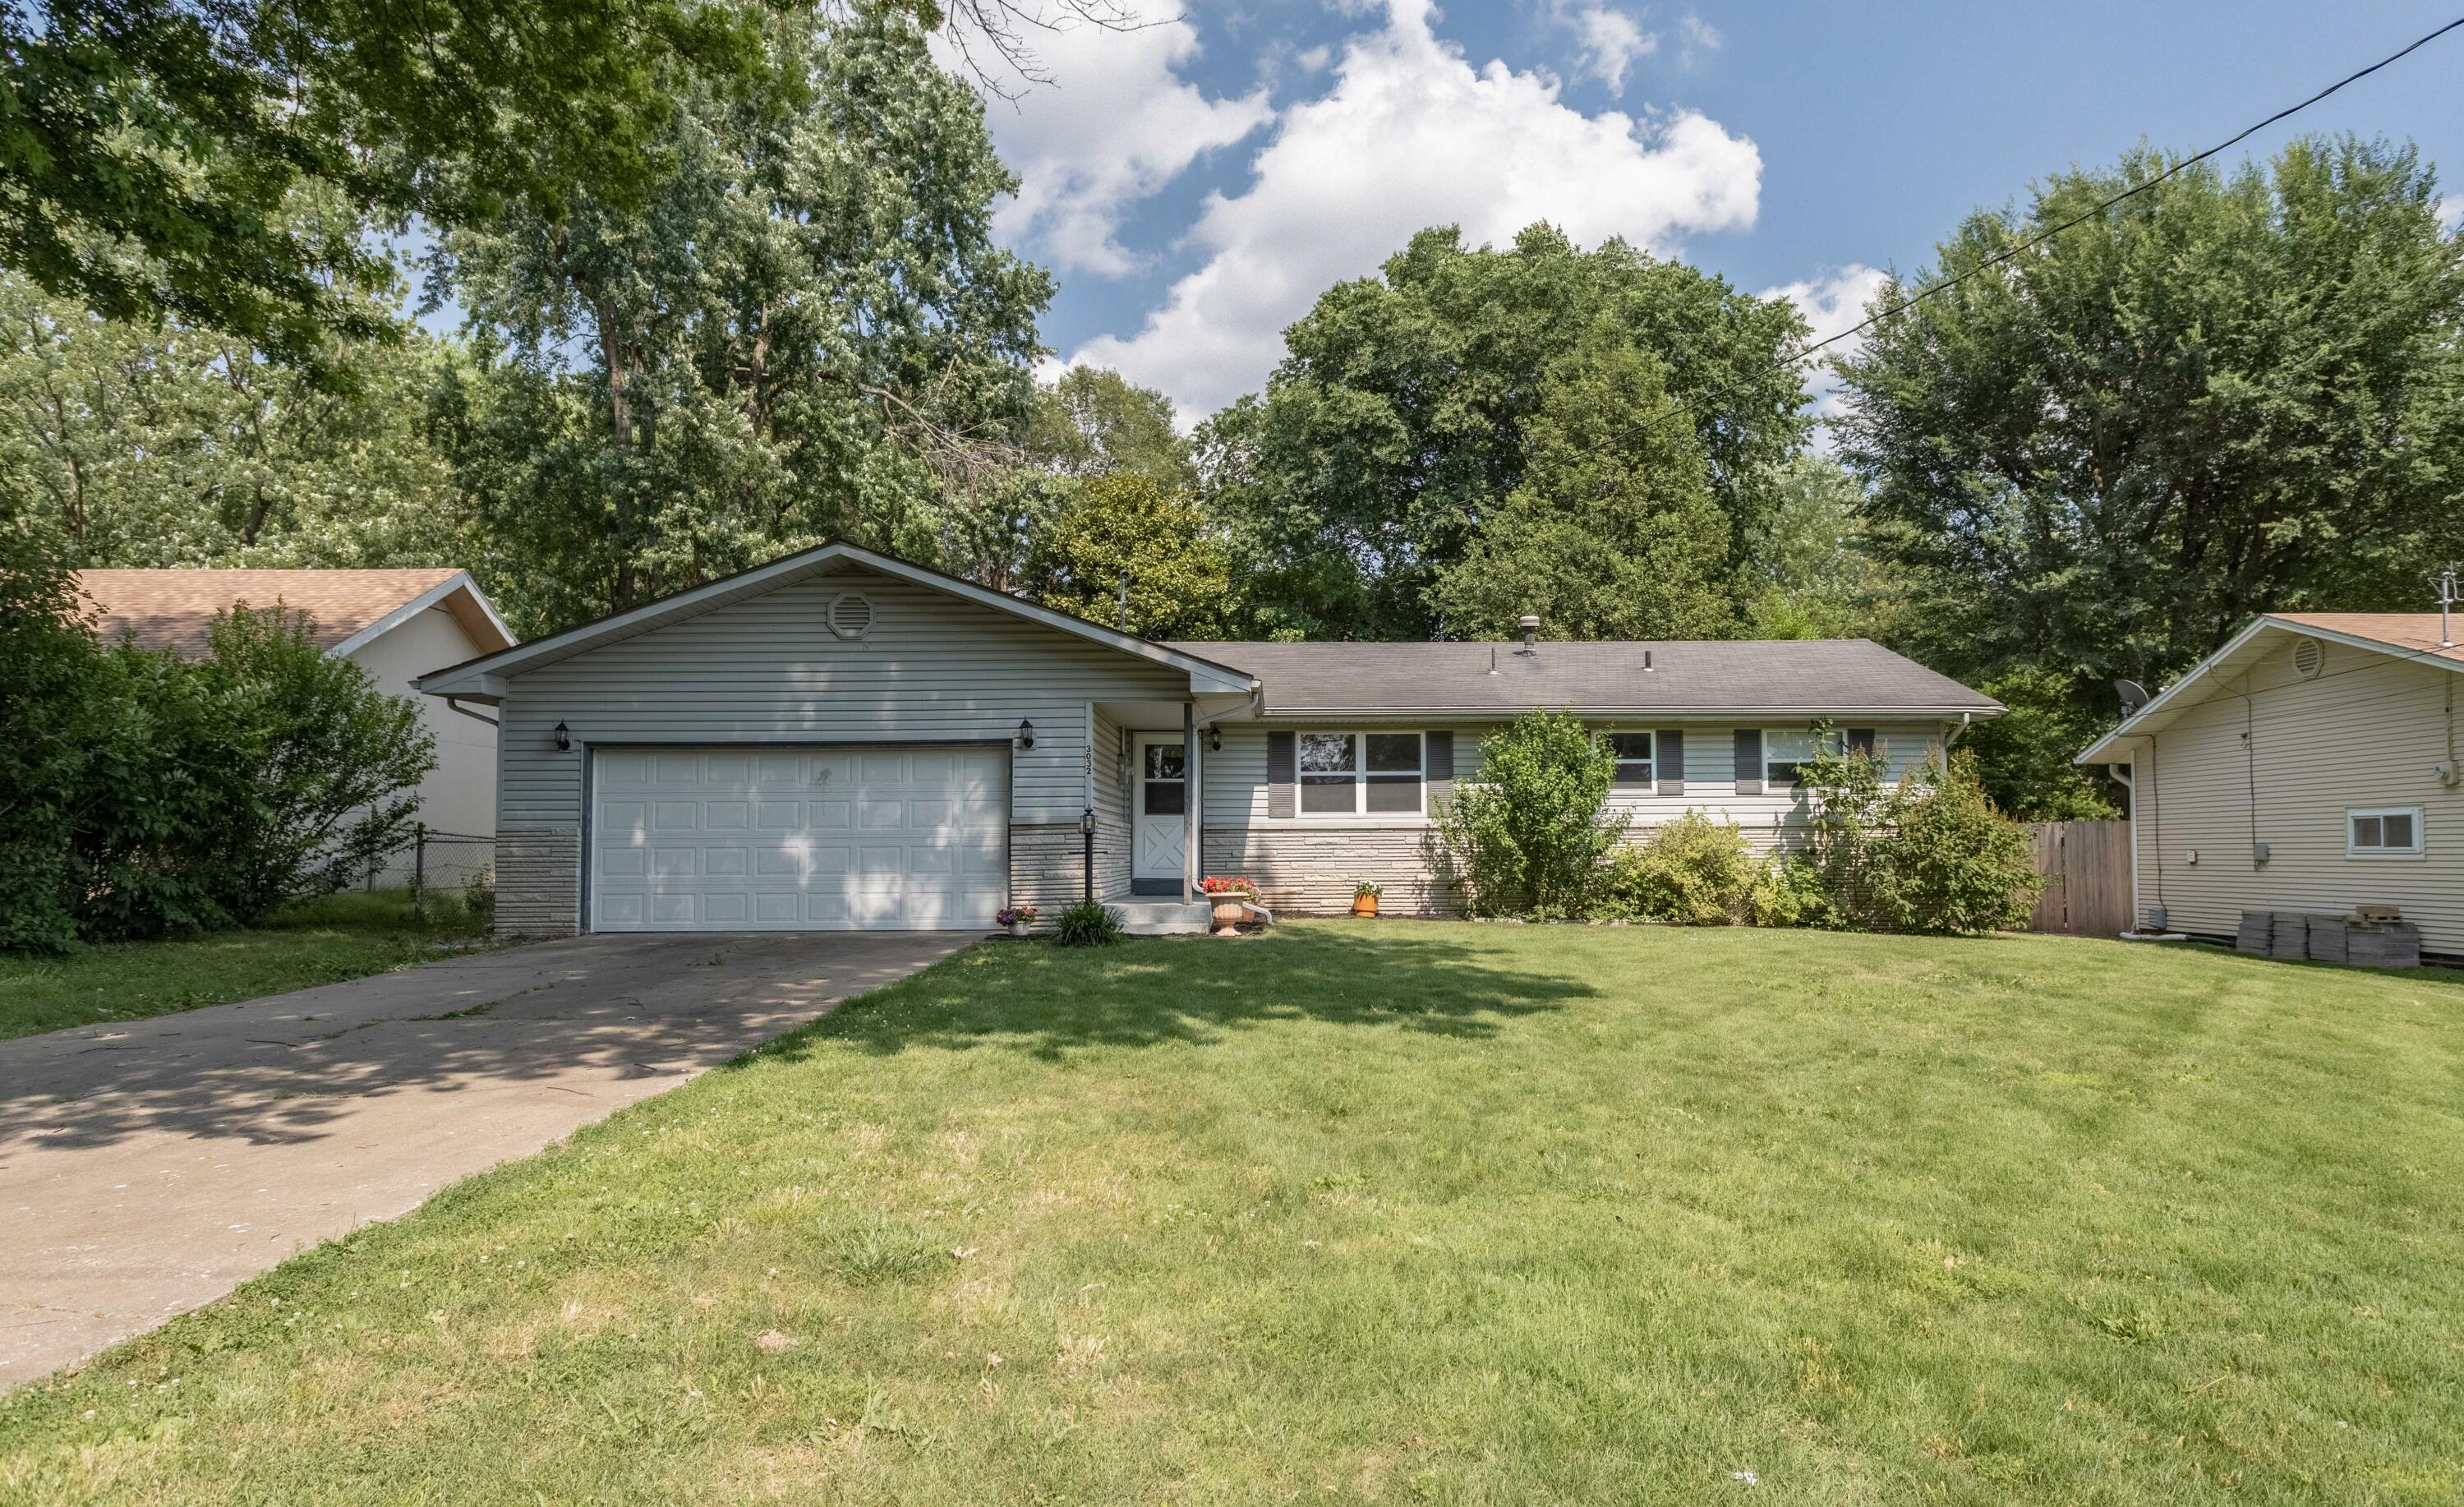 Property for sale at 3032 South Ferguson, Springfield,  Missouri 65807